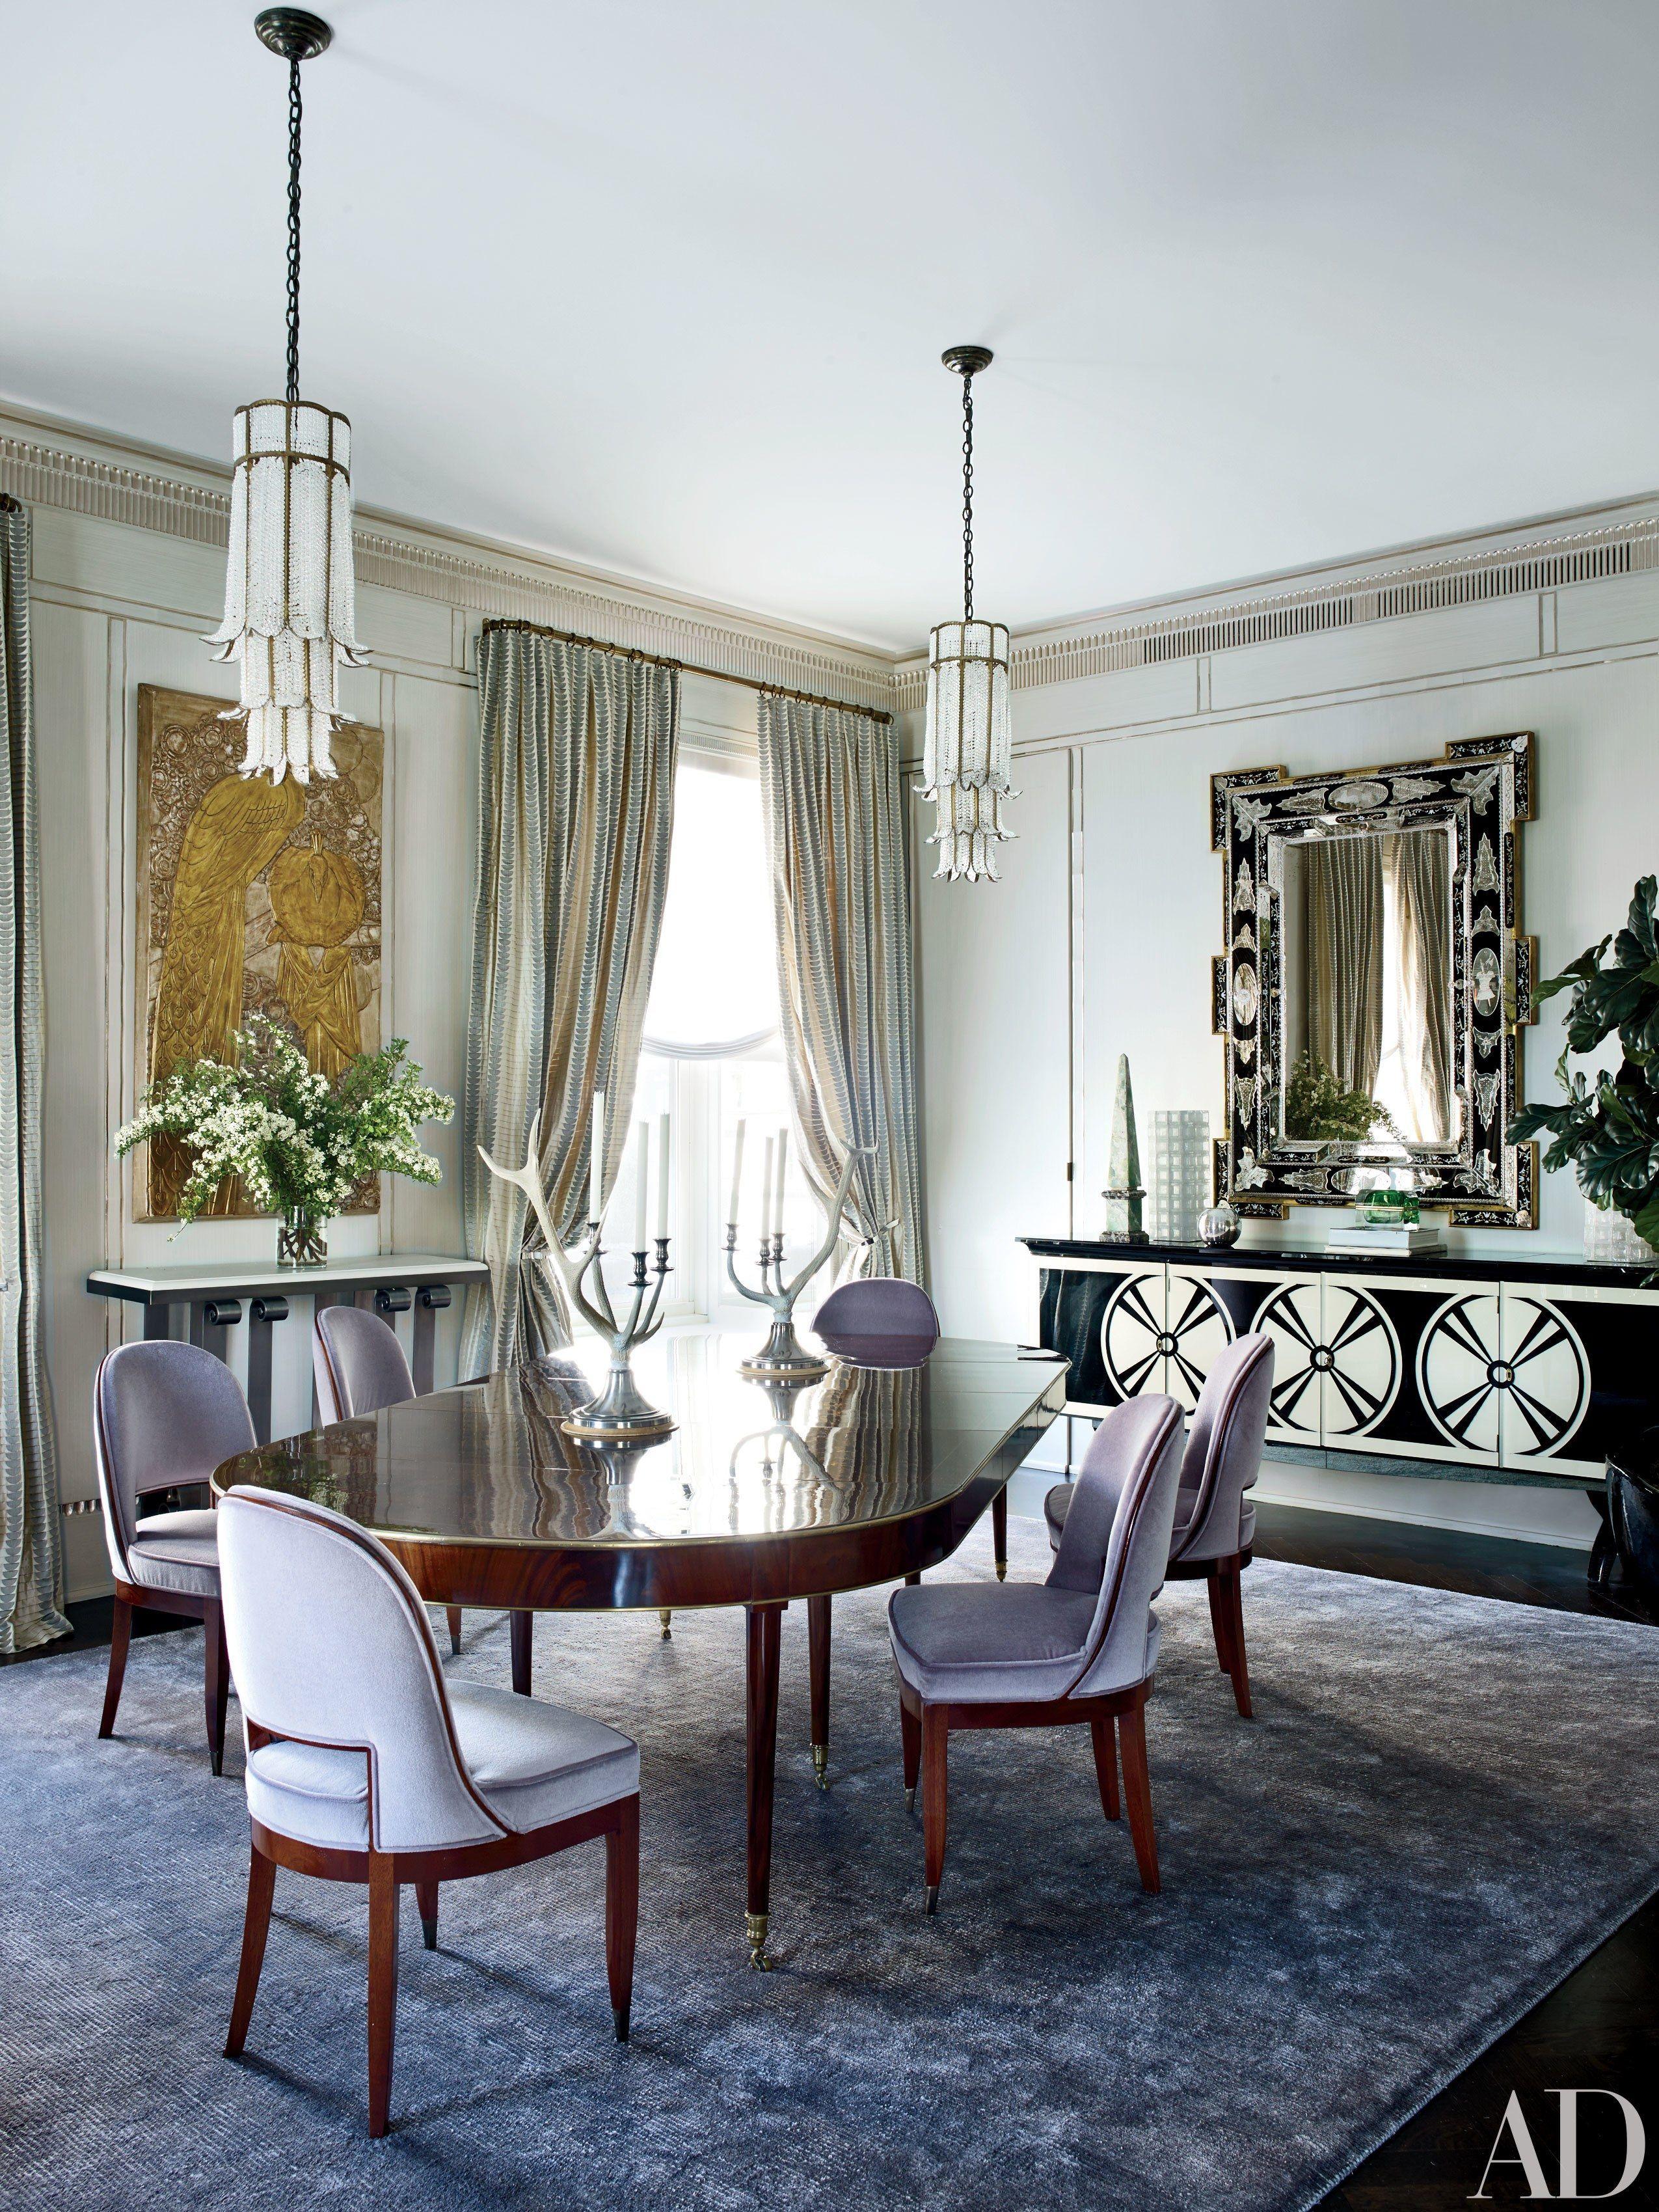 32 Elegant Ideas For Dining Rooms Design Diningroomdesignsindianstyle Diningroomfloorplandesign Diningroomg Art Deco Dining Room Art Deco Home Interior Deco